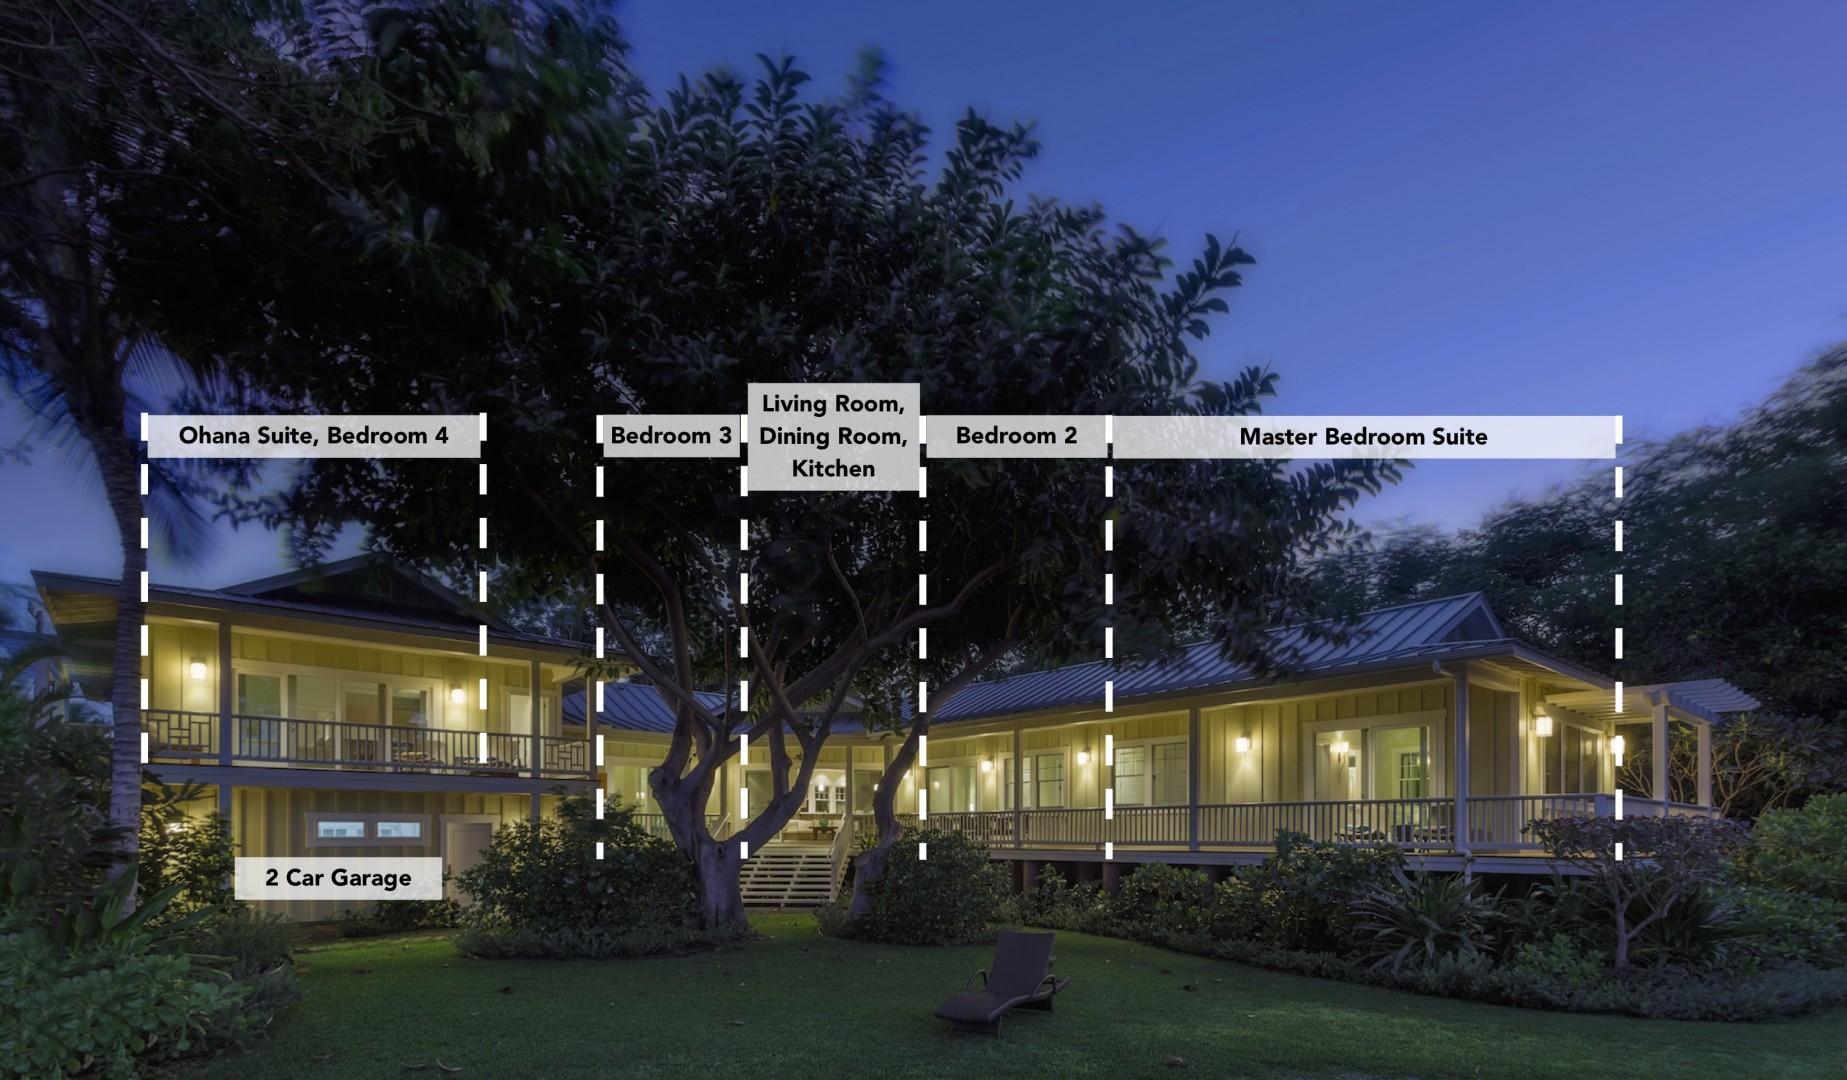 Twilight View of the Elegant Estate, Including Ohana Guest Suite above 2 car garage